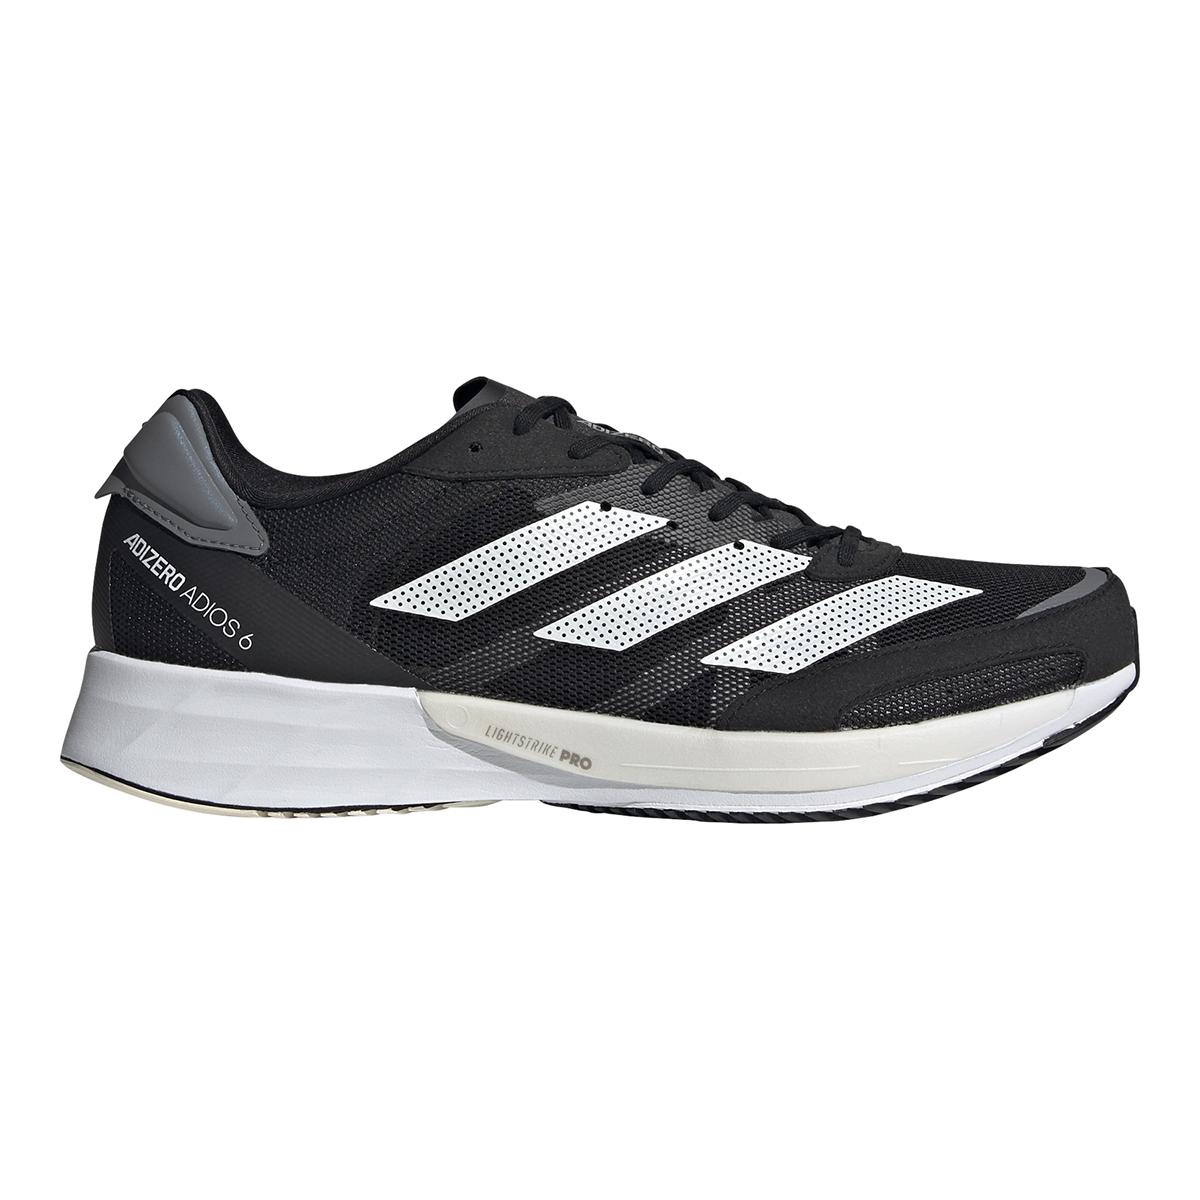 Men's Adidas Adizero Adios 6 Running Shoe - Color: Black/White/Grey - Size: 6 - Width: Regular, Black/White/Grey, large, image 1